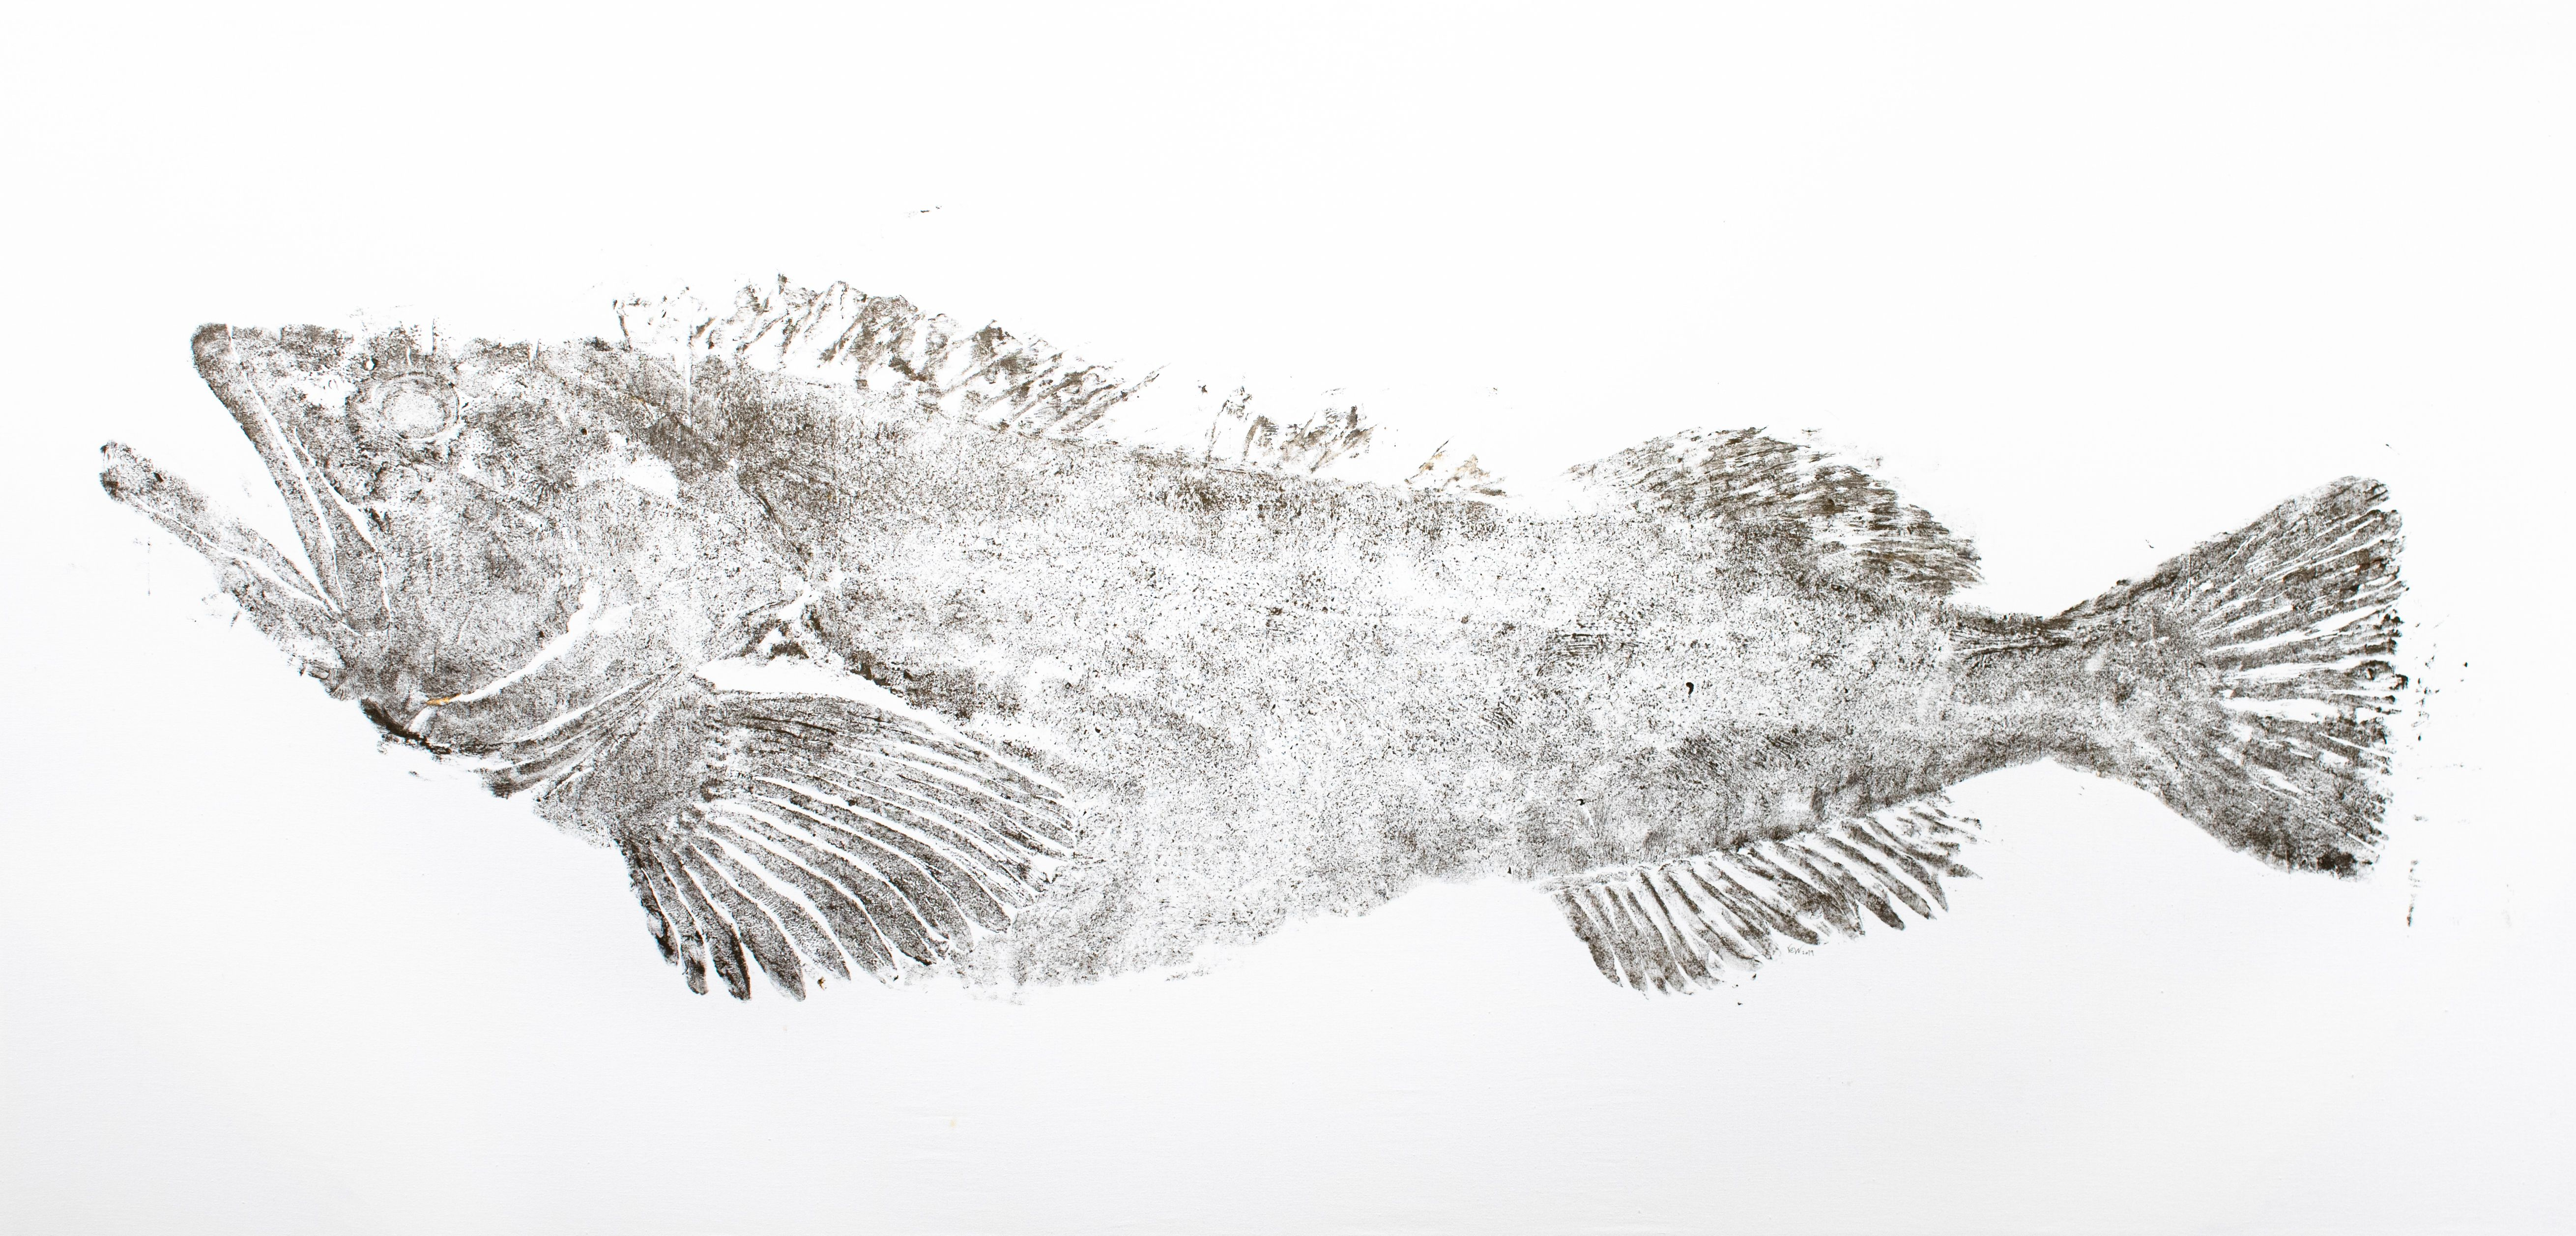 Ling Cod, 46lbs